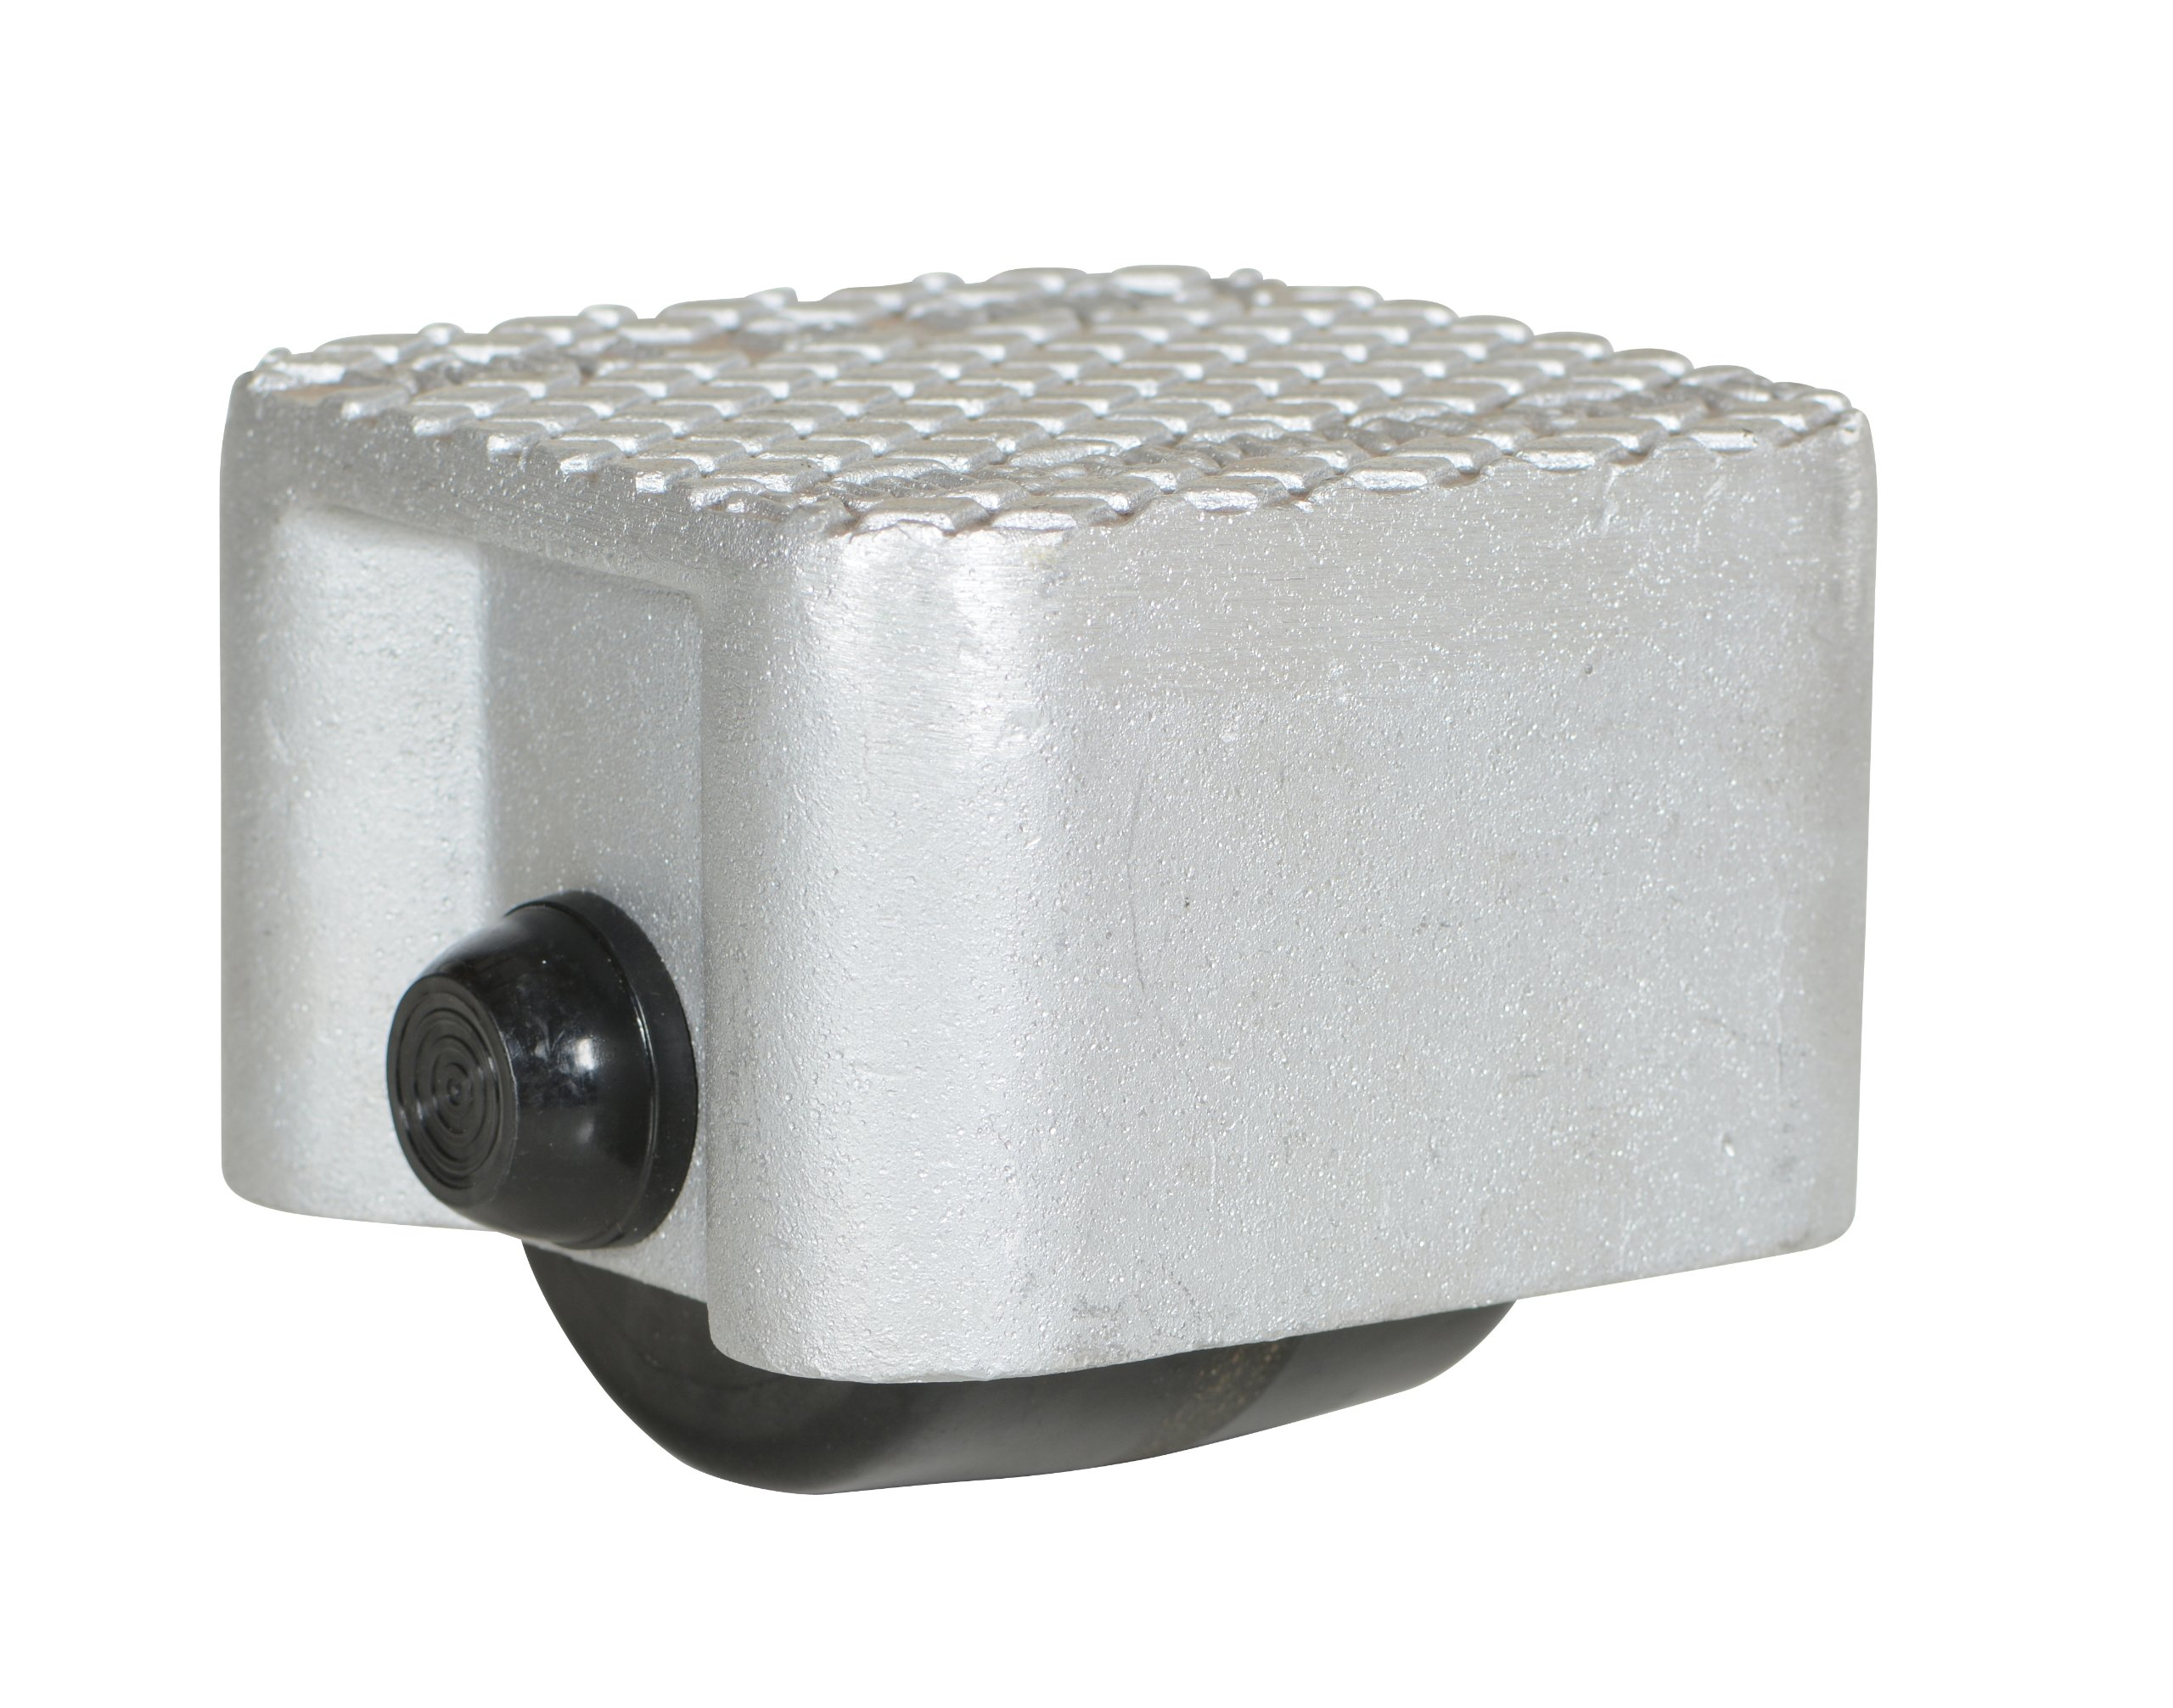 Vestil VPRDO-1 Cast Aluminum Propel Dolly, 1500 lbs Capacity, 4-1/2'' Length x 4-1/2'' Width Deck, 4-1/4'' Overall Height